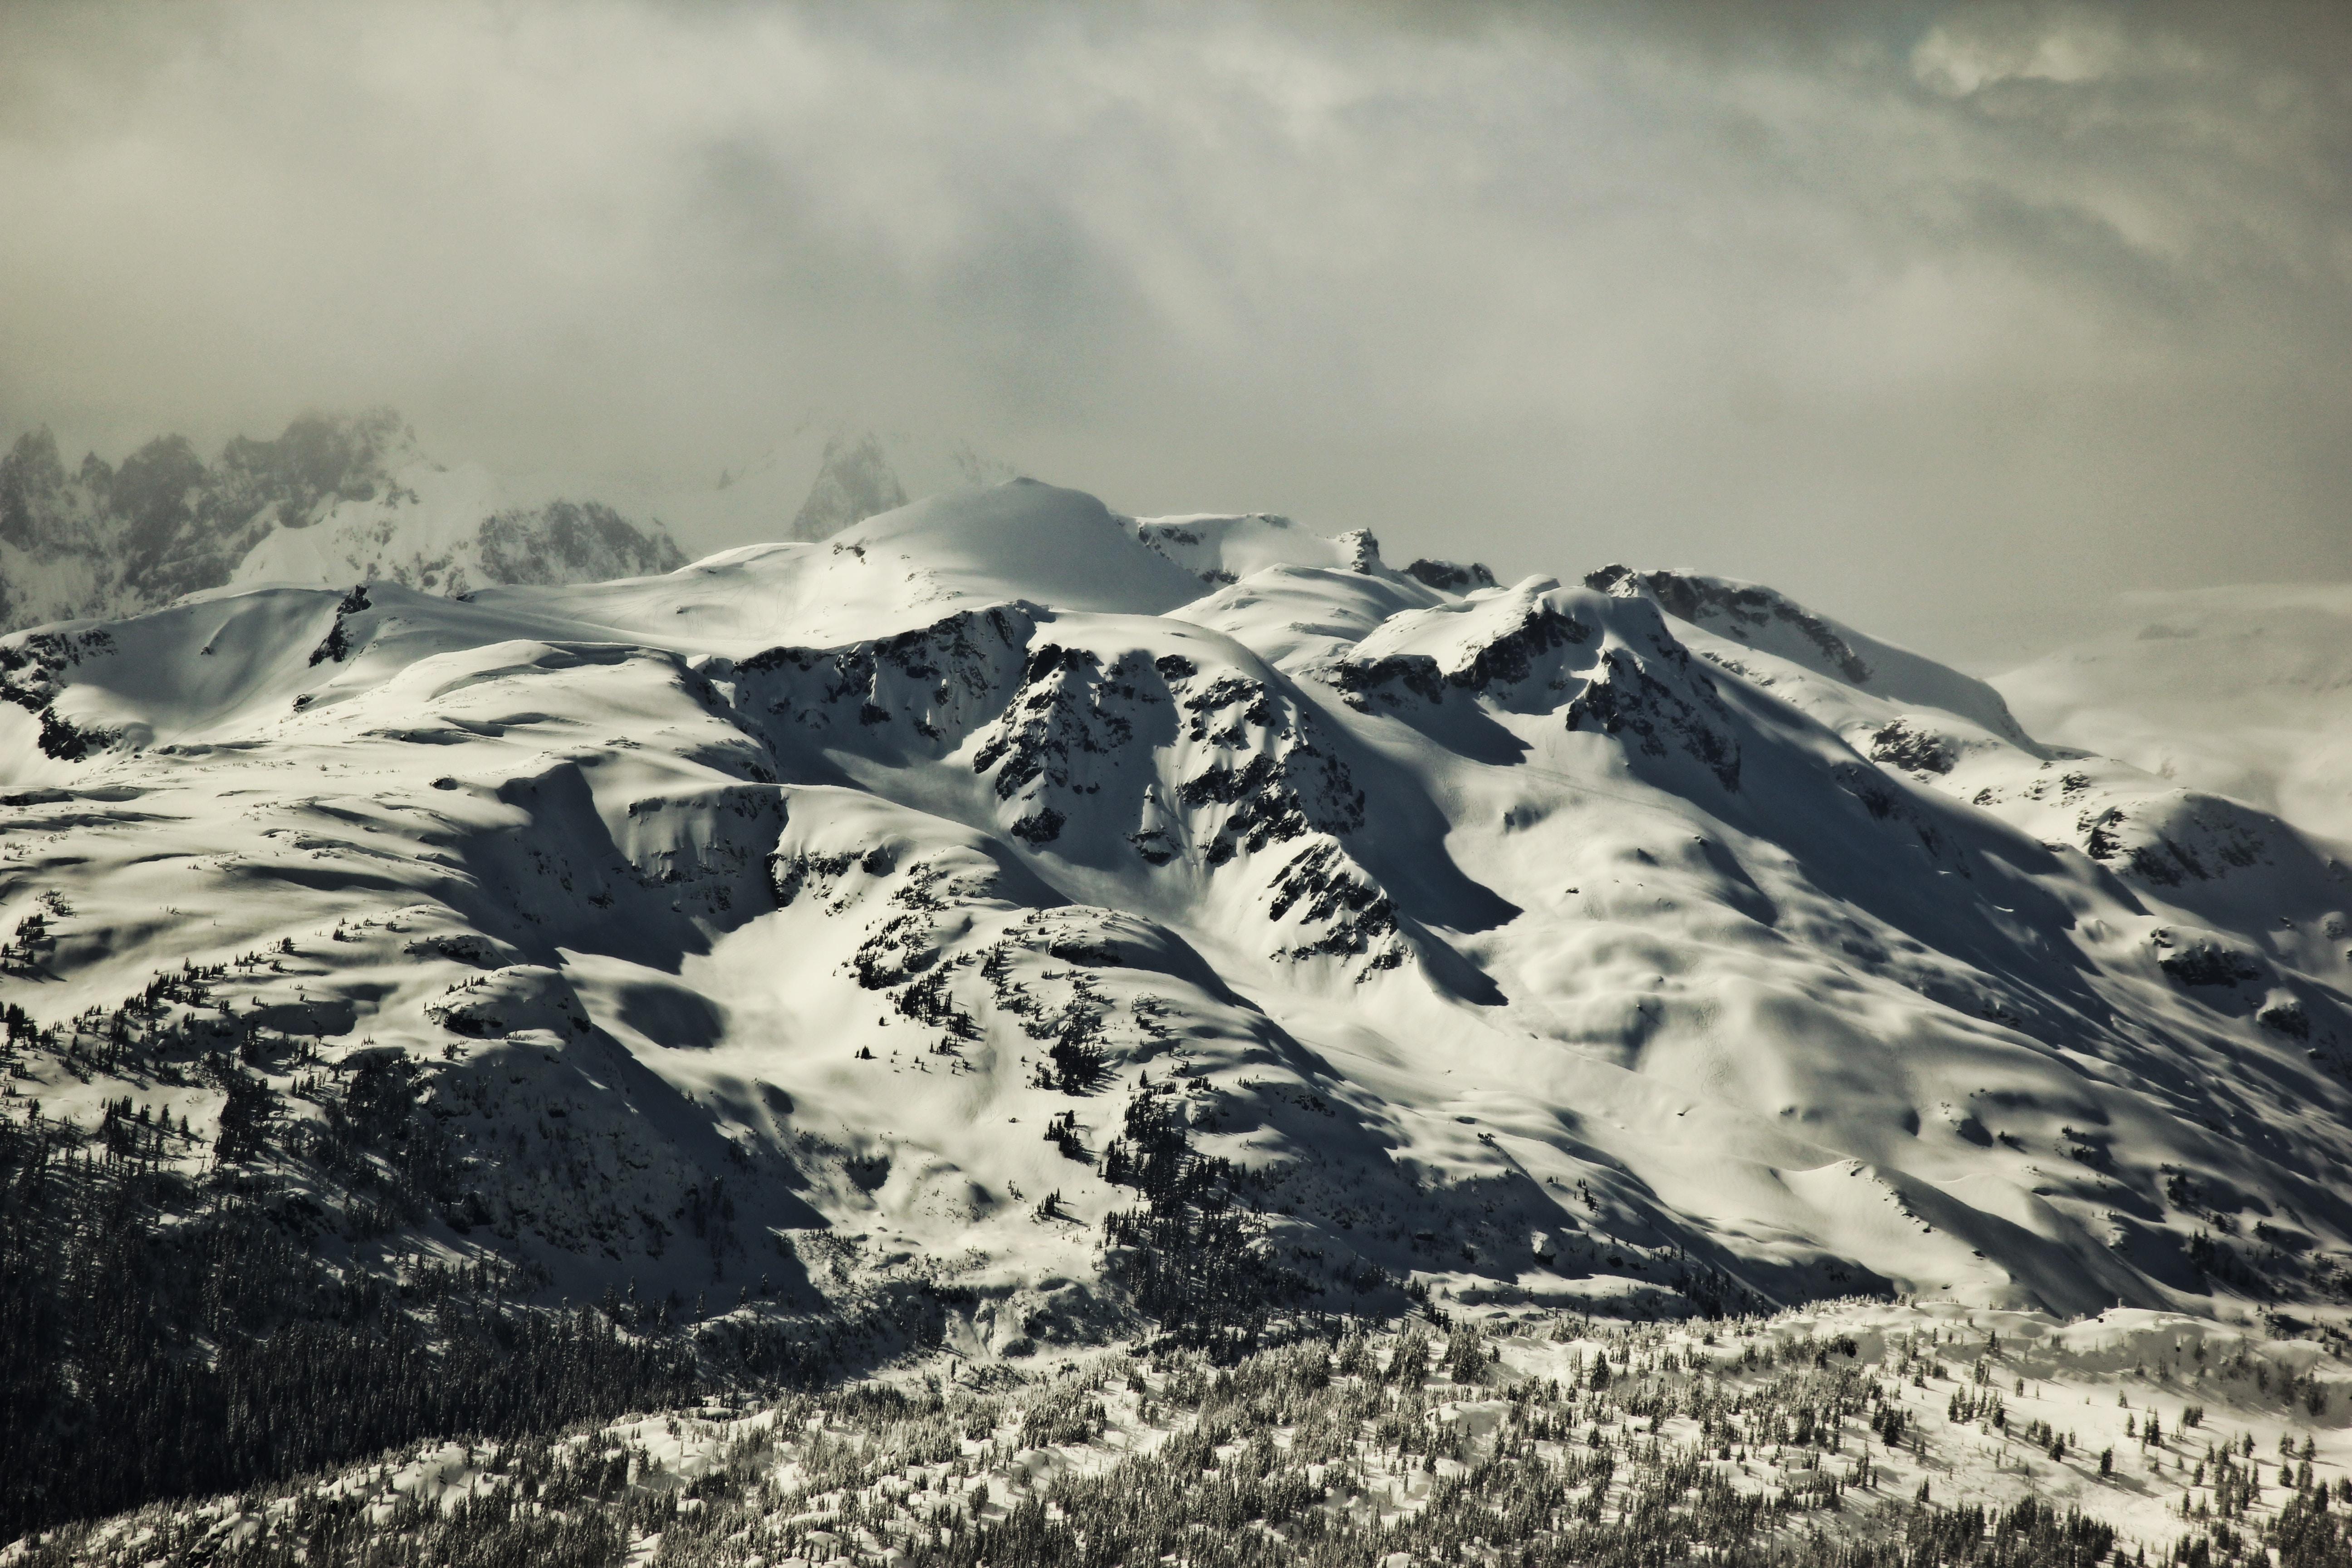 Snow on a mountain range with a cloudy sky on an overcast day